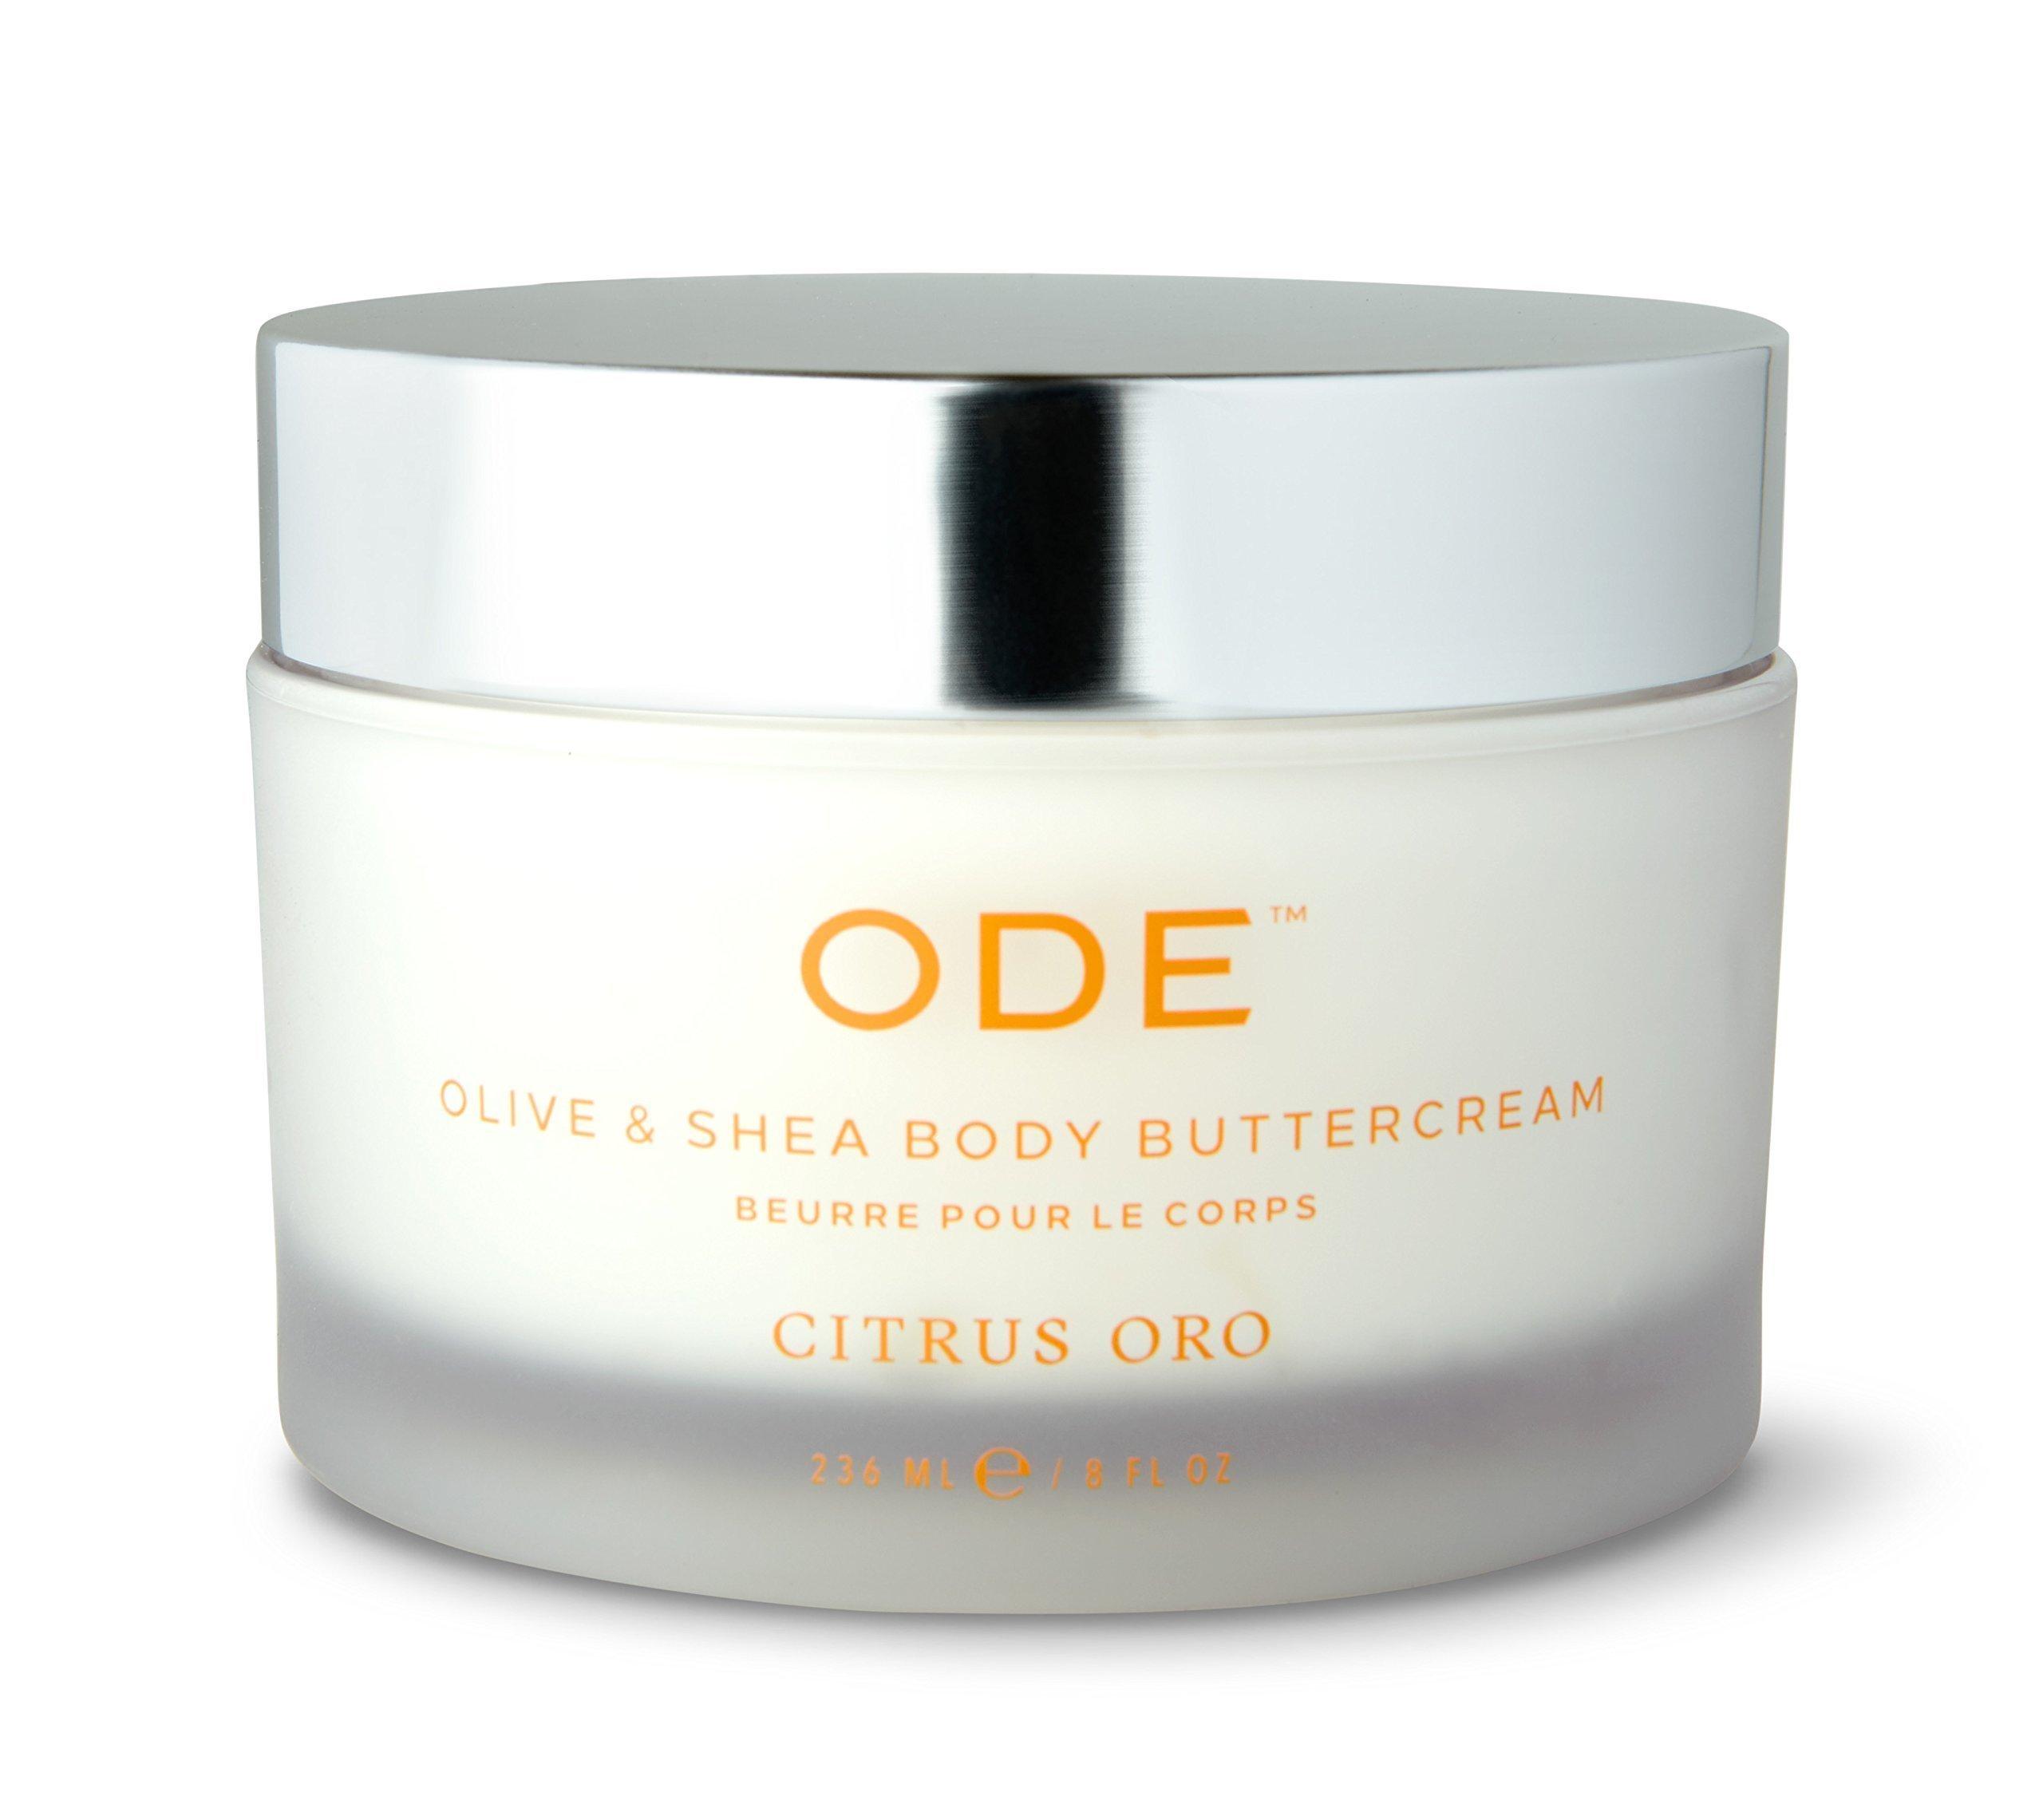 ODE natural beauty - Citrus Oro Olive & Shea Body Buttercream